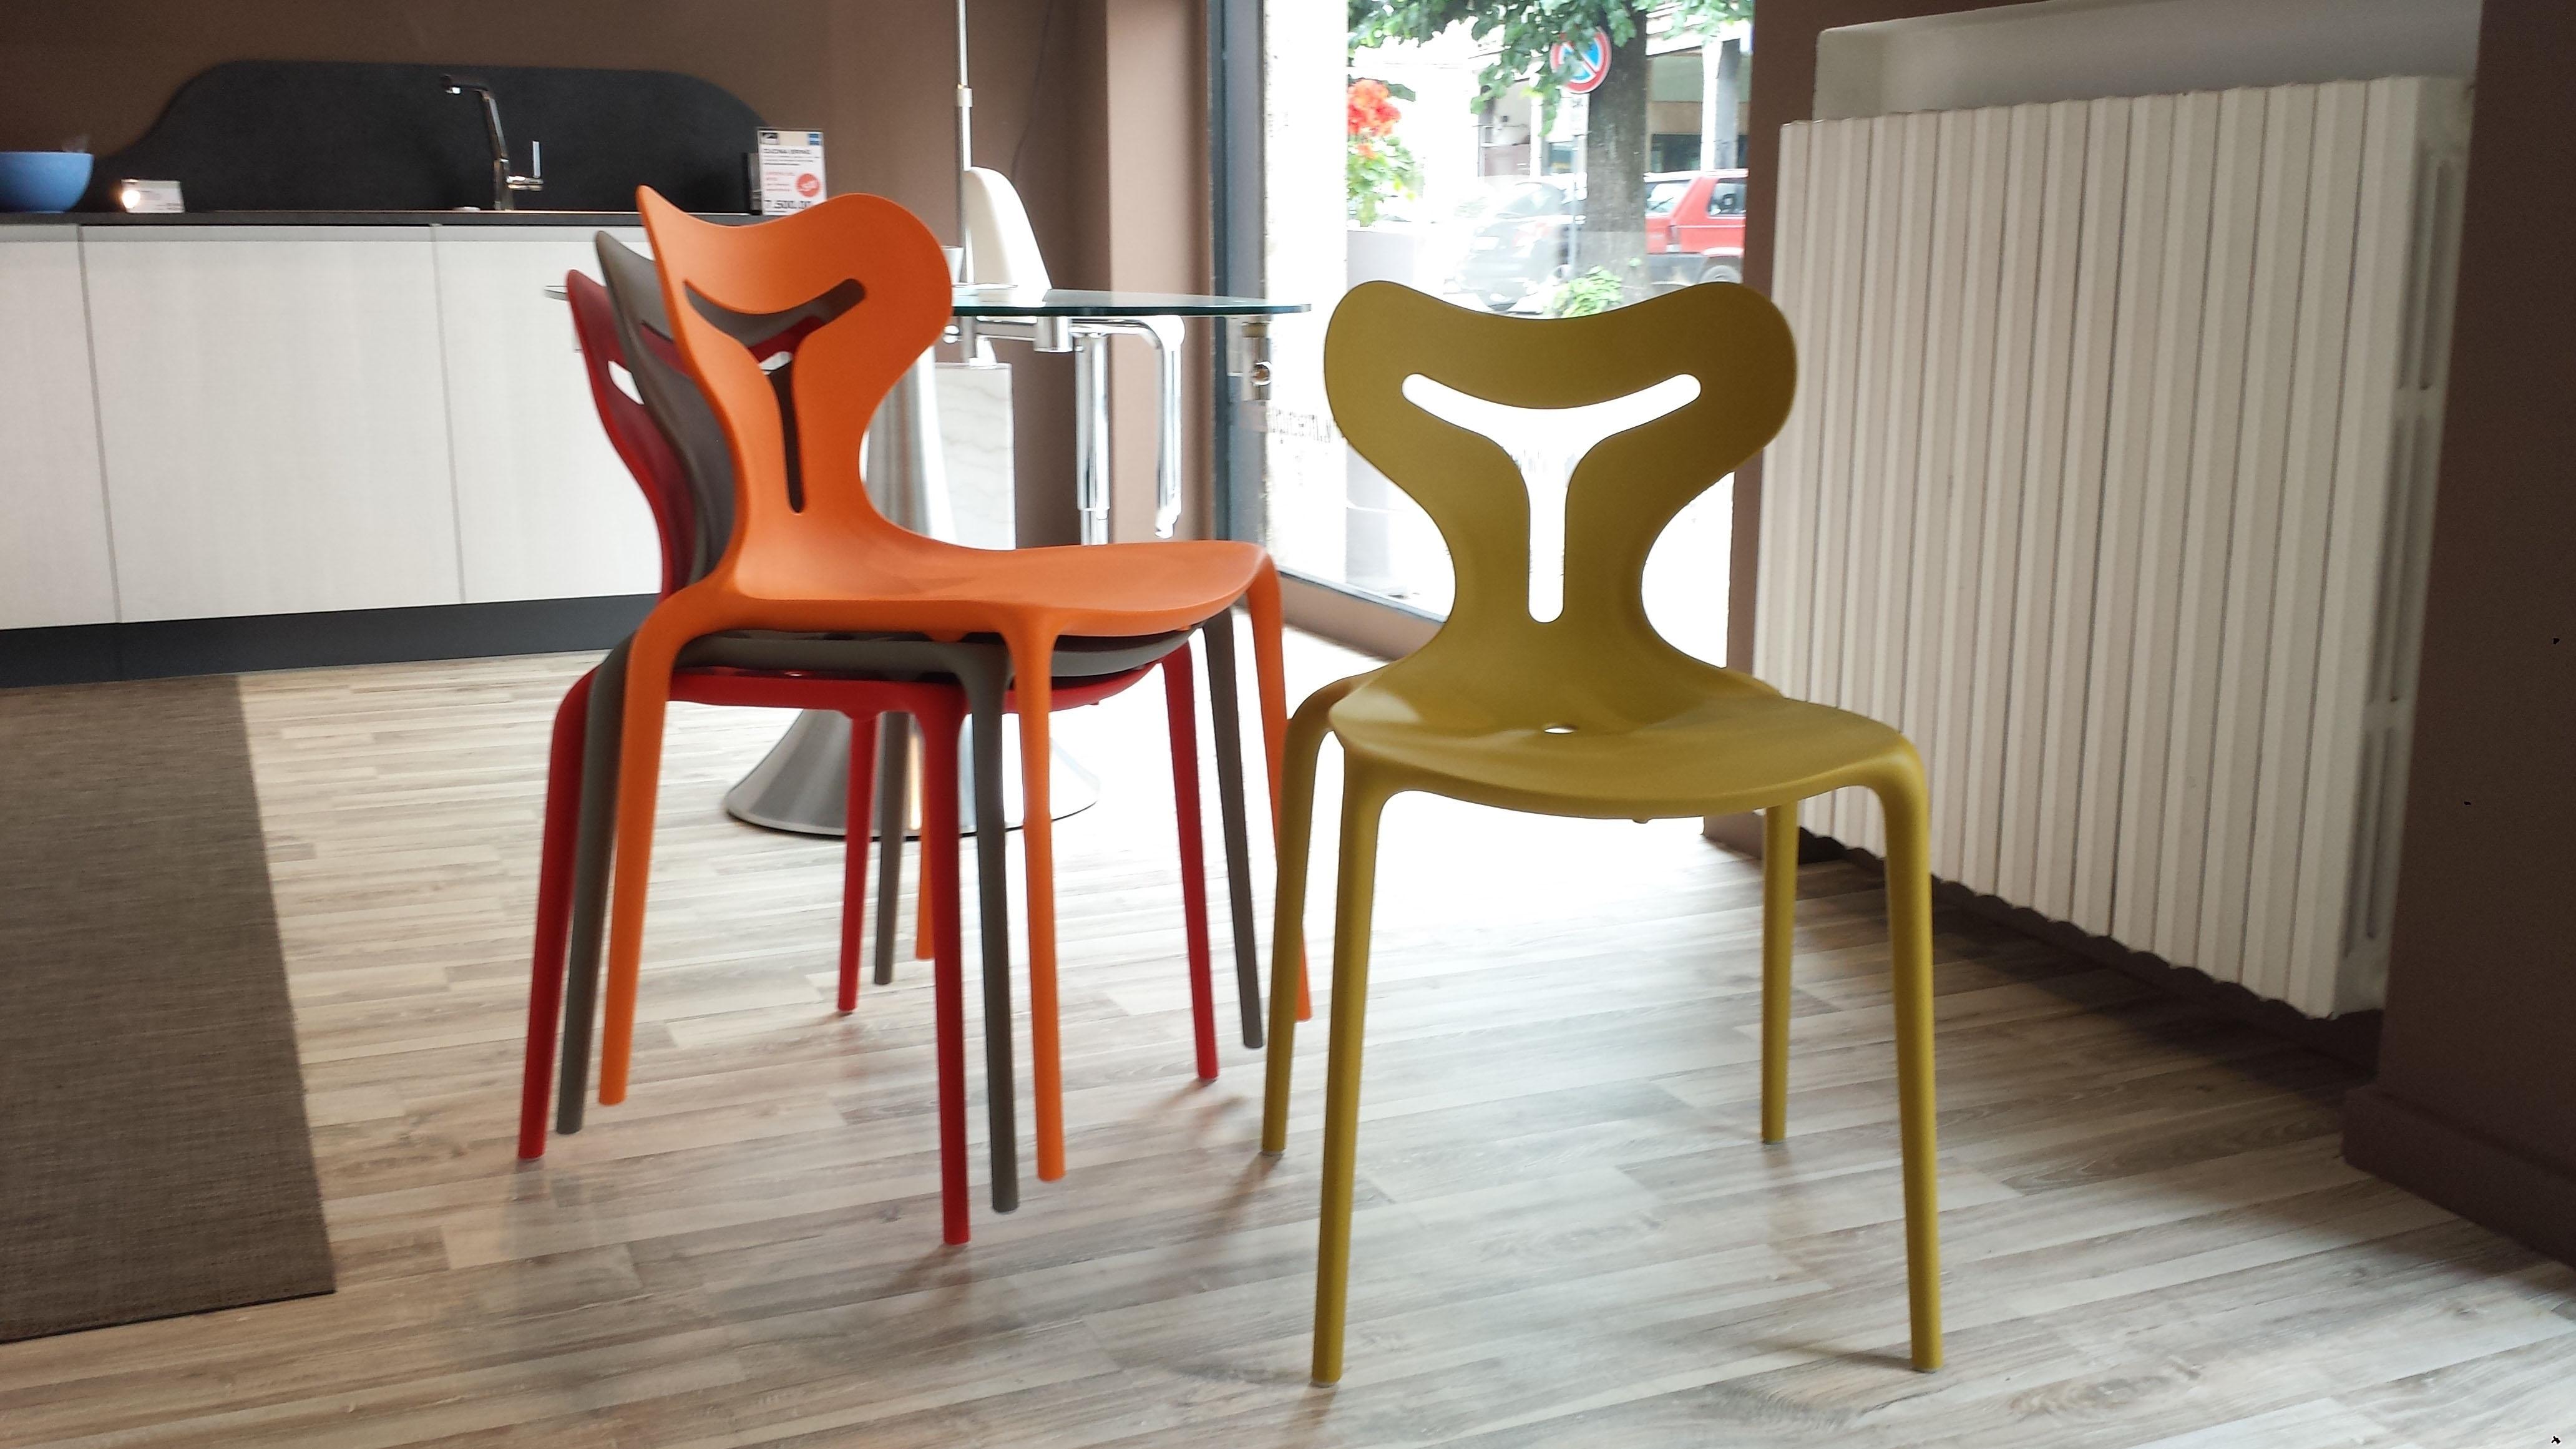 sedia calligaris area51 20799 sedie a prezzi scontati